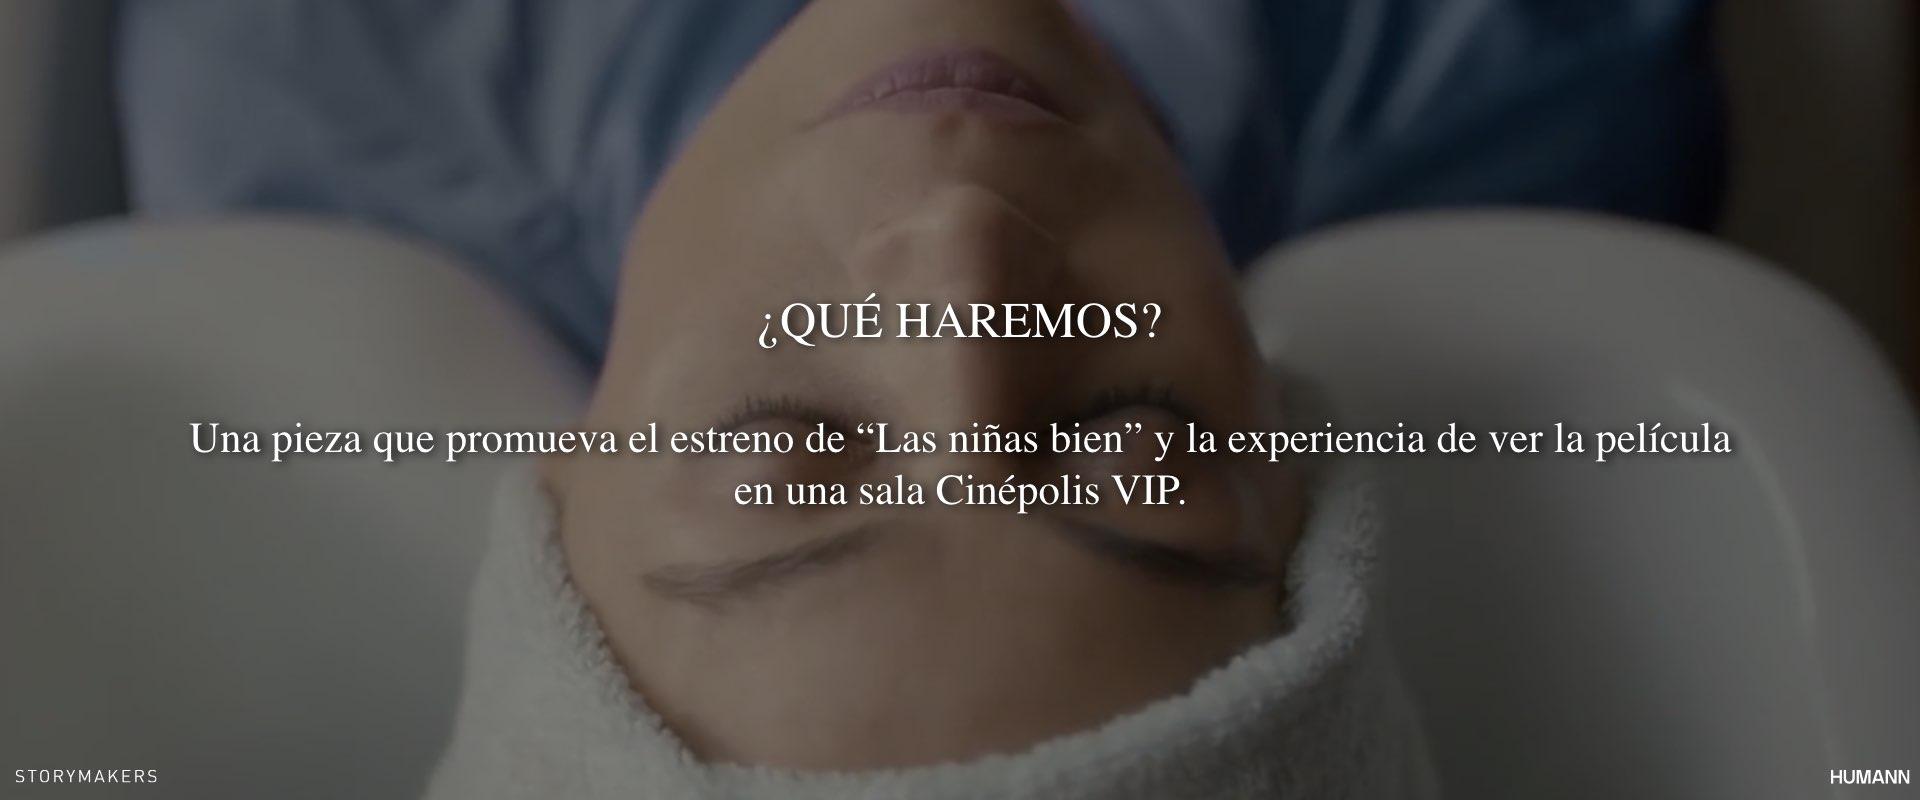 Humann :: Cinepolis Distribución :: Las Niñas Bien.006.jpeg